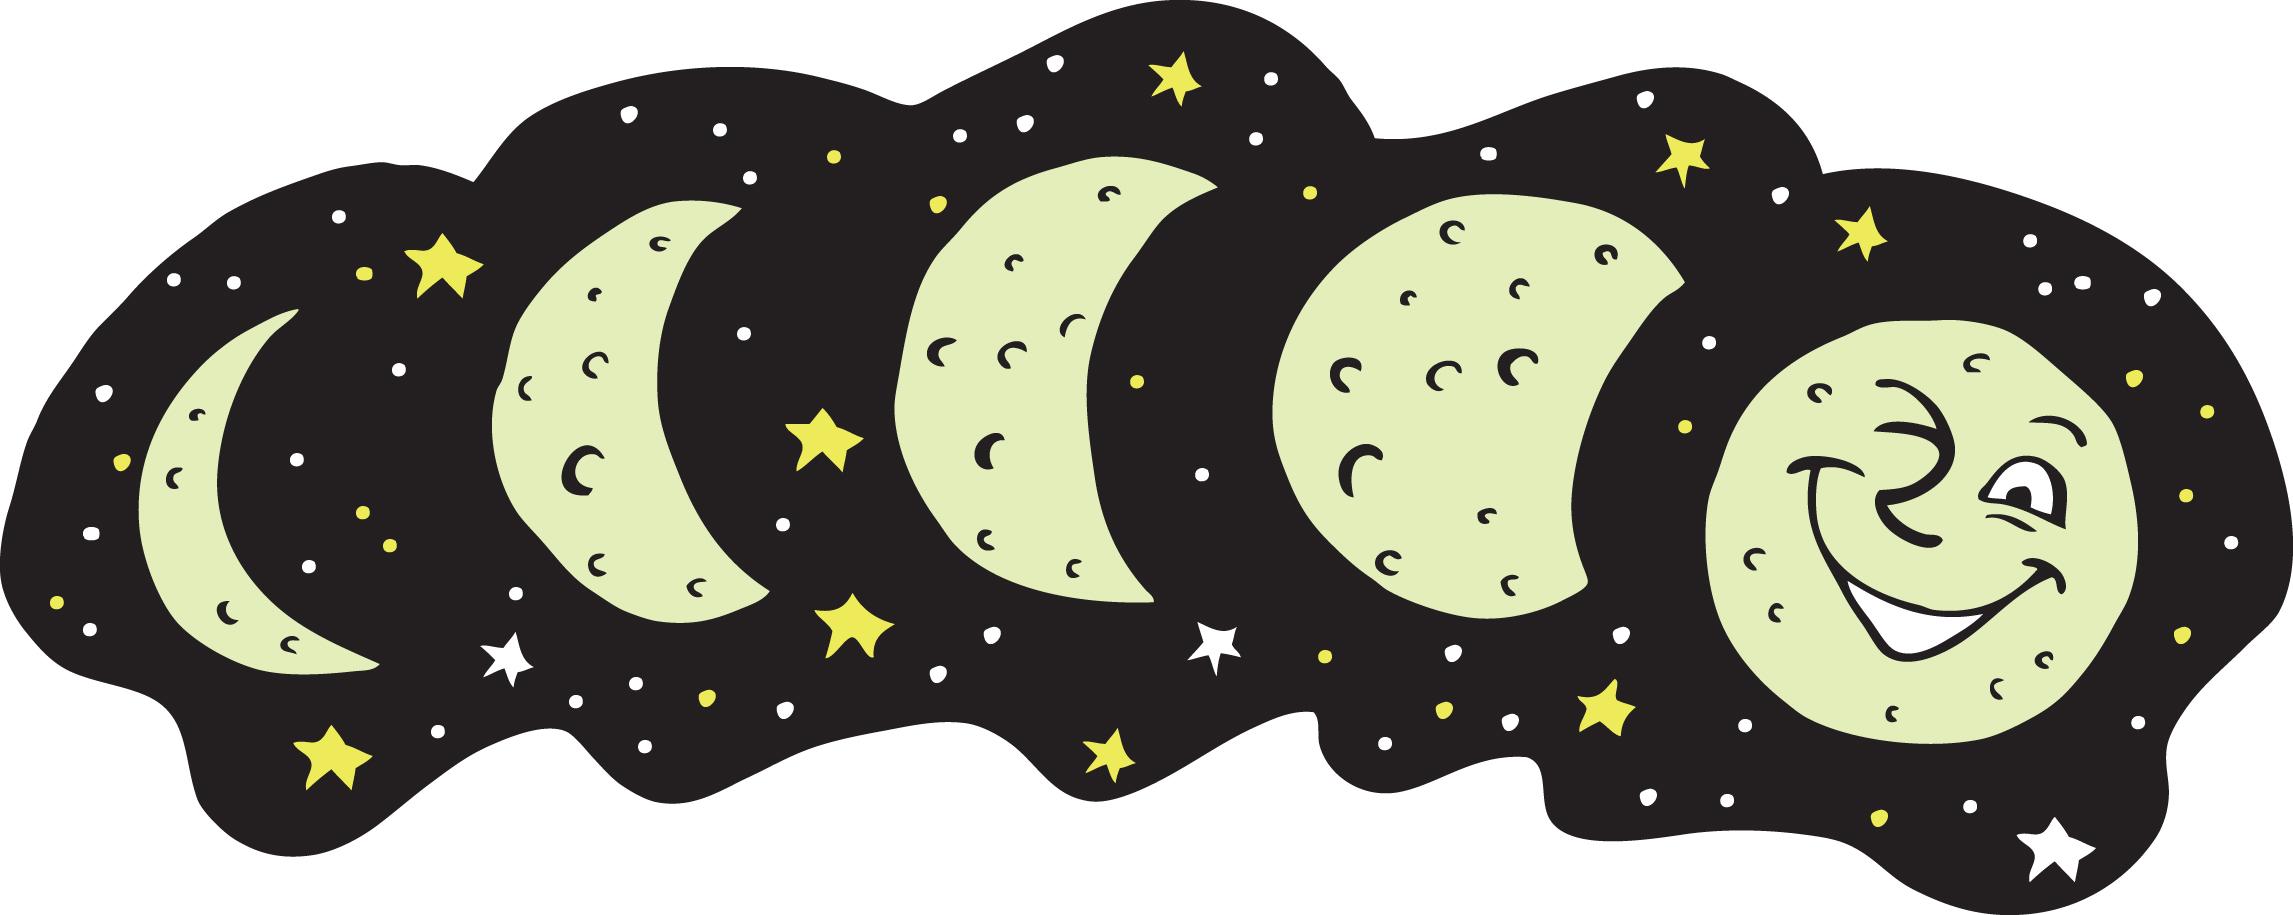 Moon phases color copy c1987d3